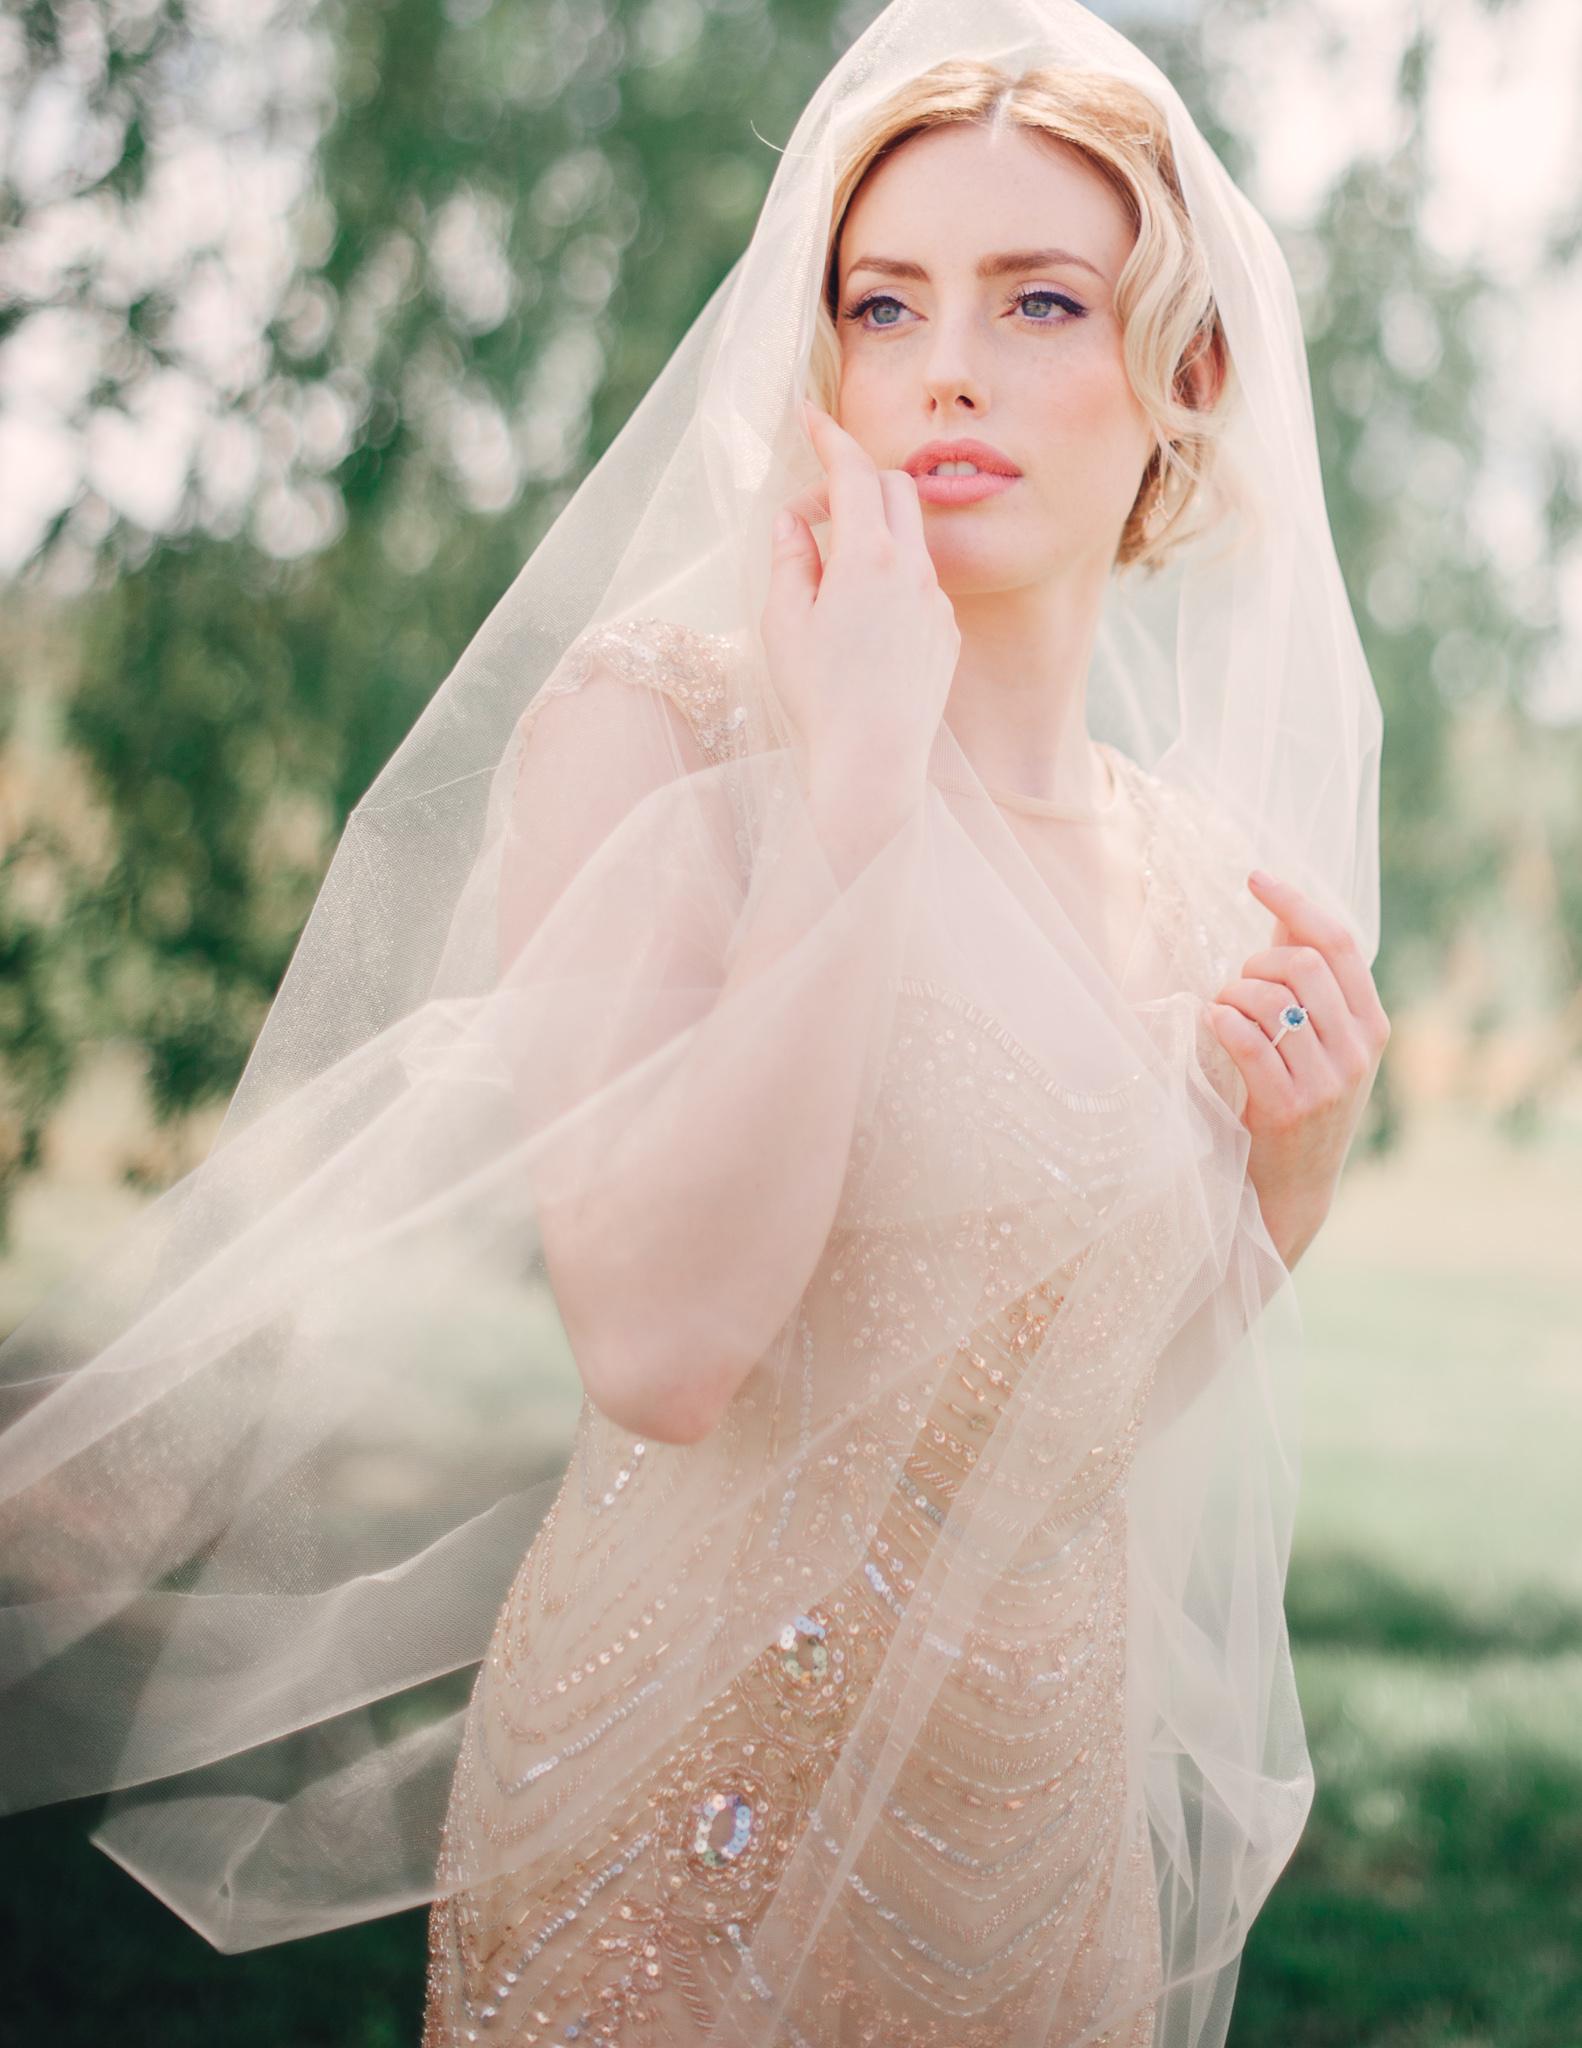 virginiawedding_bridalphotos_charlottesvillewedding_youseephotography_TrumpWinery (79).jpg